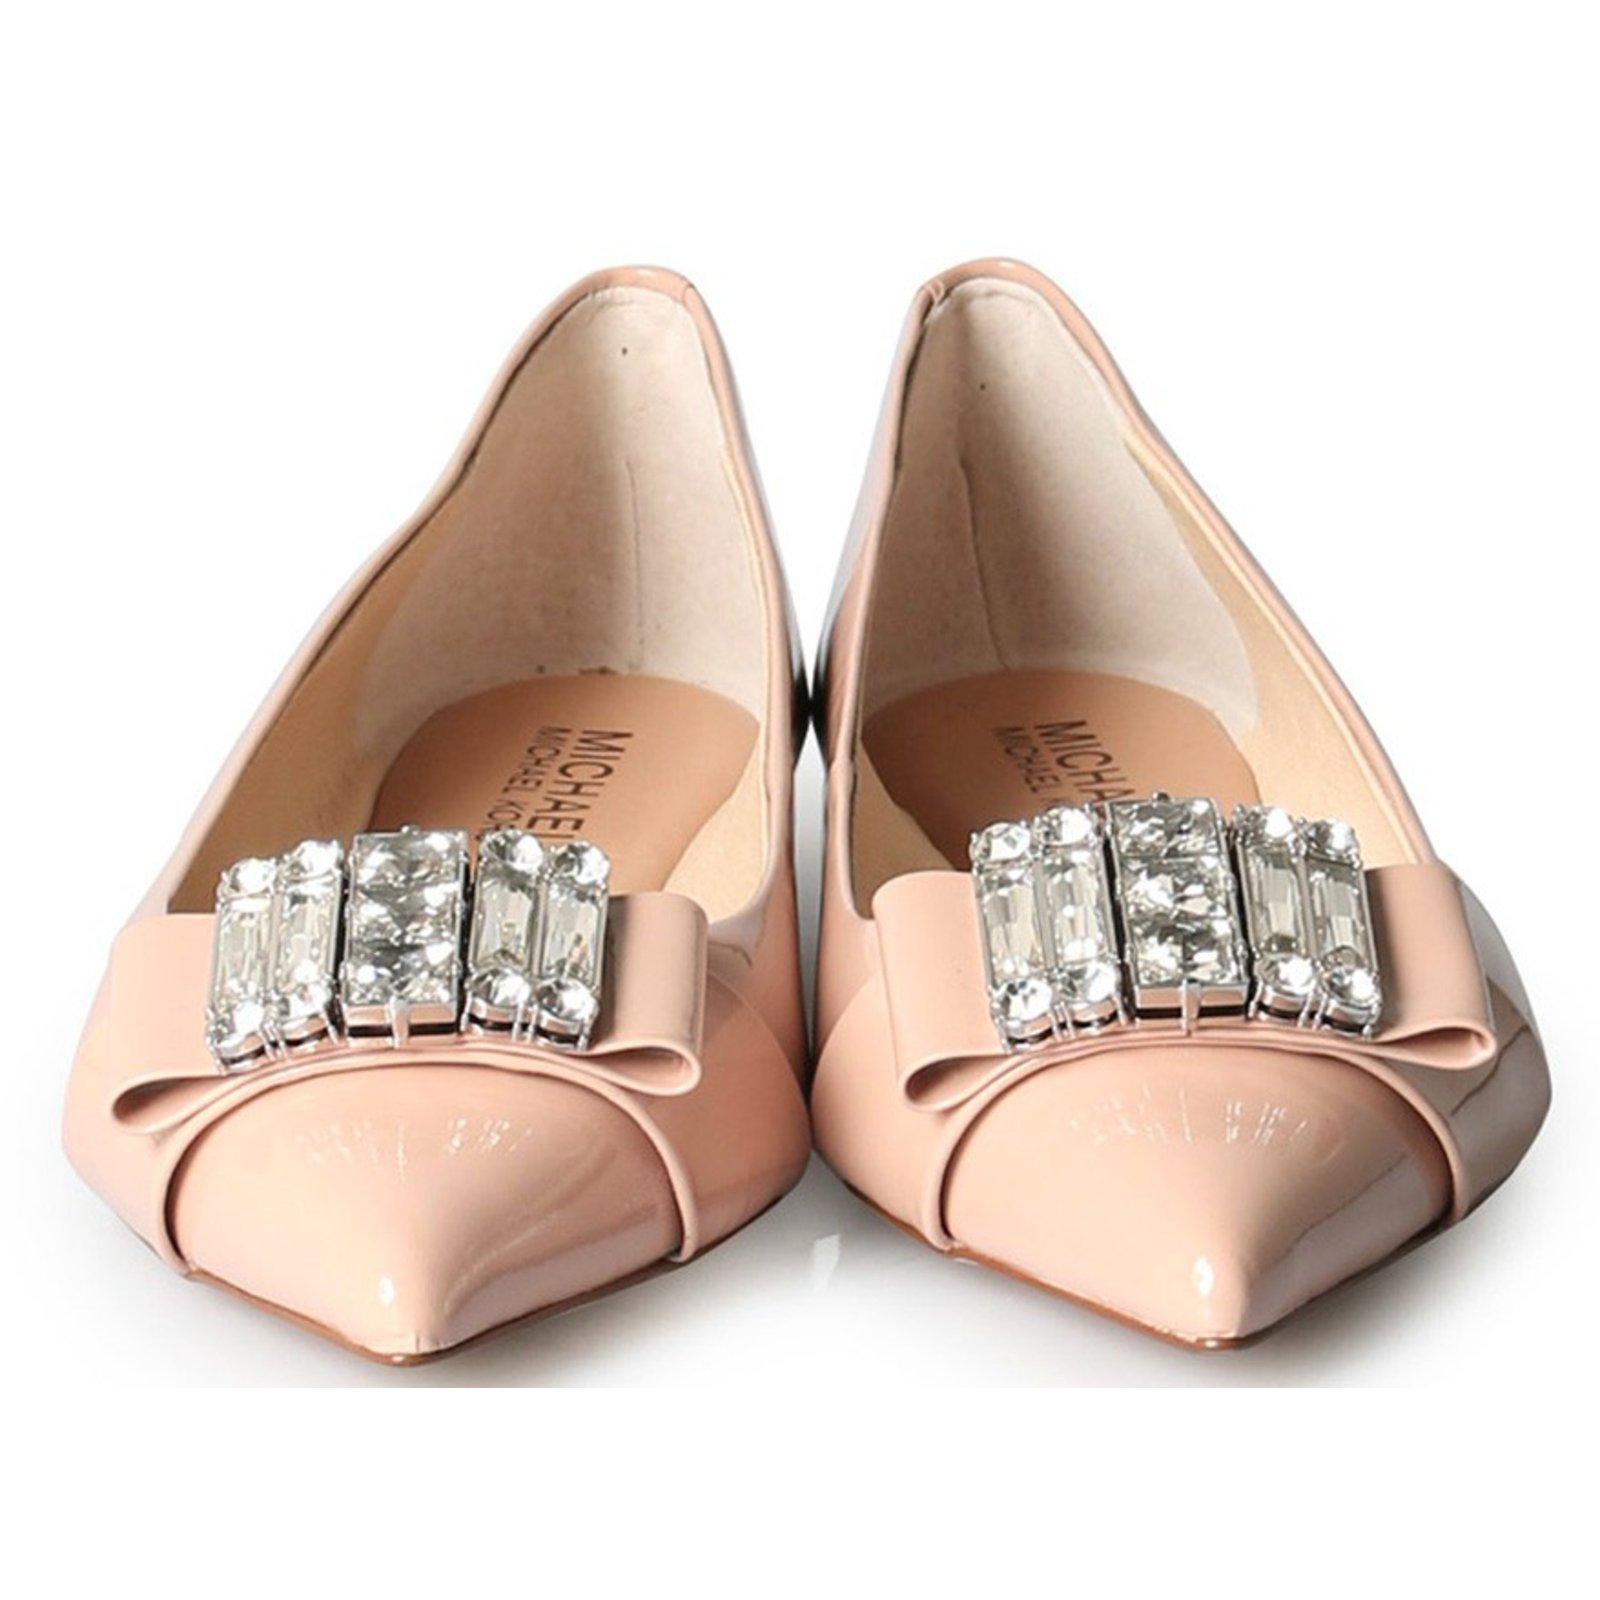 a90c149a5 Michael Kors Ballet flats Ballet flats Patent leather Pink ref.31262 ...